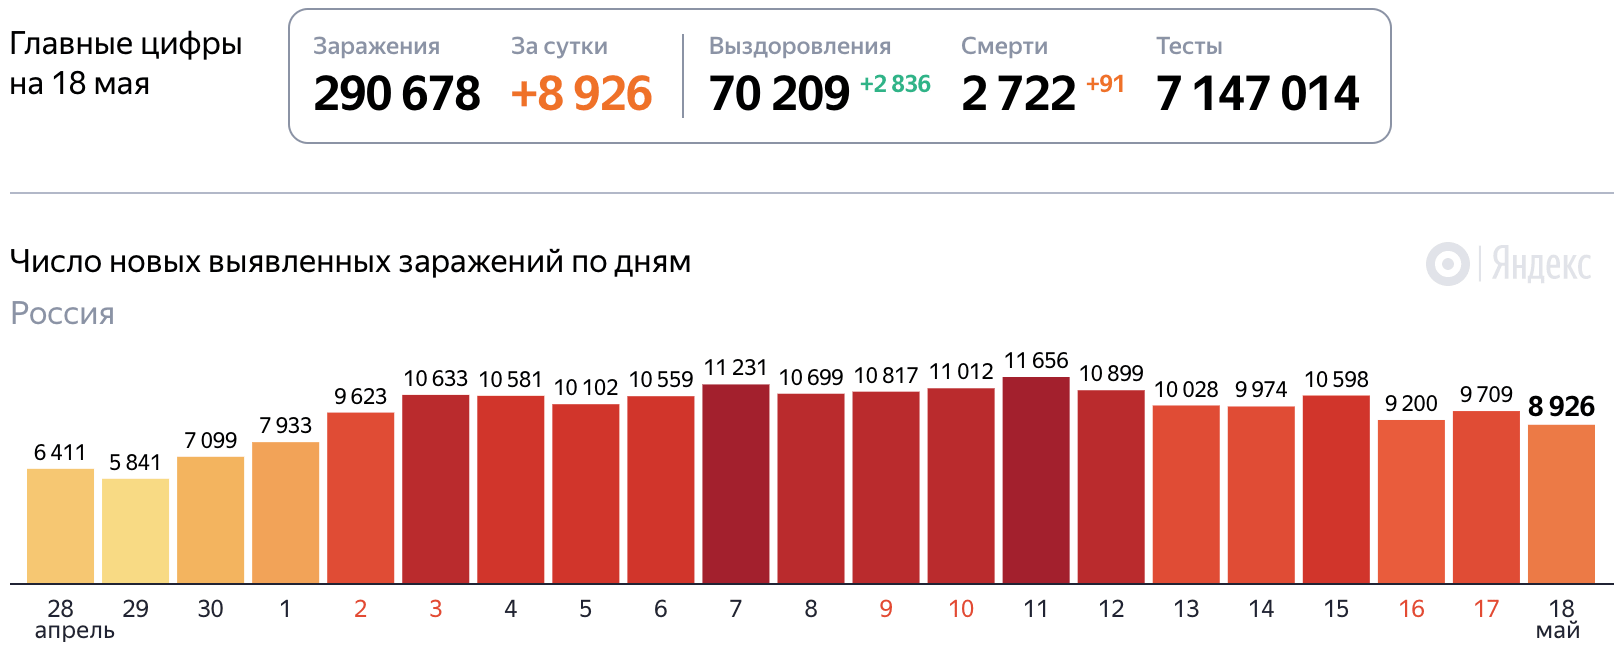 Коронавирус на 18 мая 2020 года статистика в России